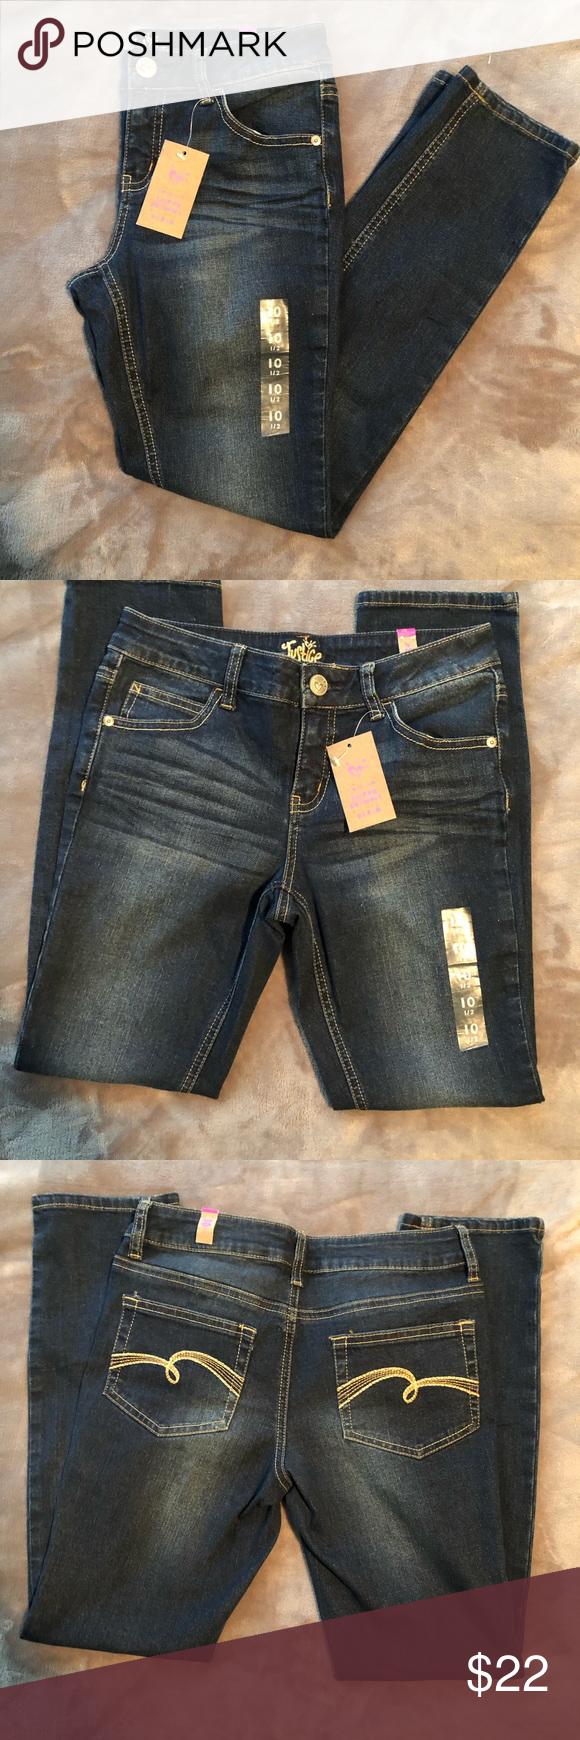 Girls Justice Jeans Super Skinny 10 1 2 Nwt Girls Justice Jeans Super Skinny 10 1 2 Nwt Justice Bottoms Jeans Fashion Clothes Design Super Skinny